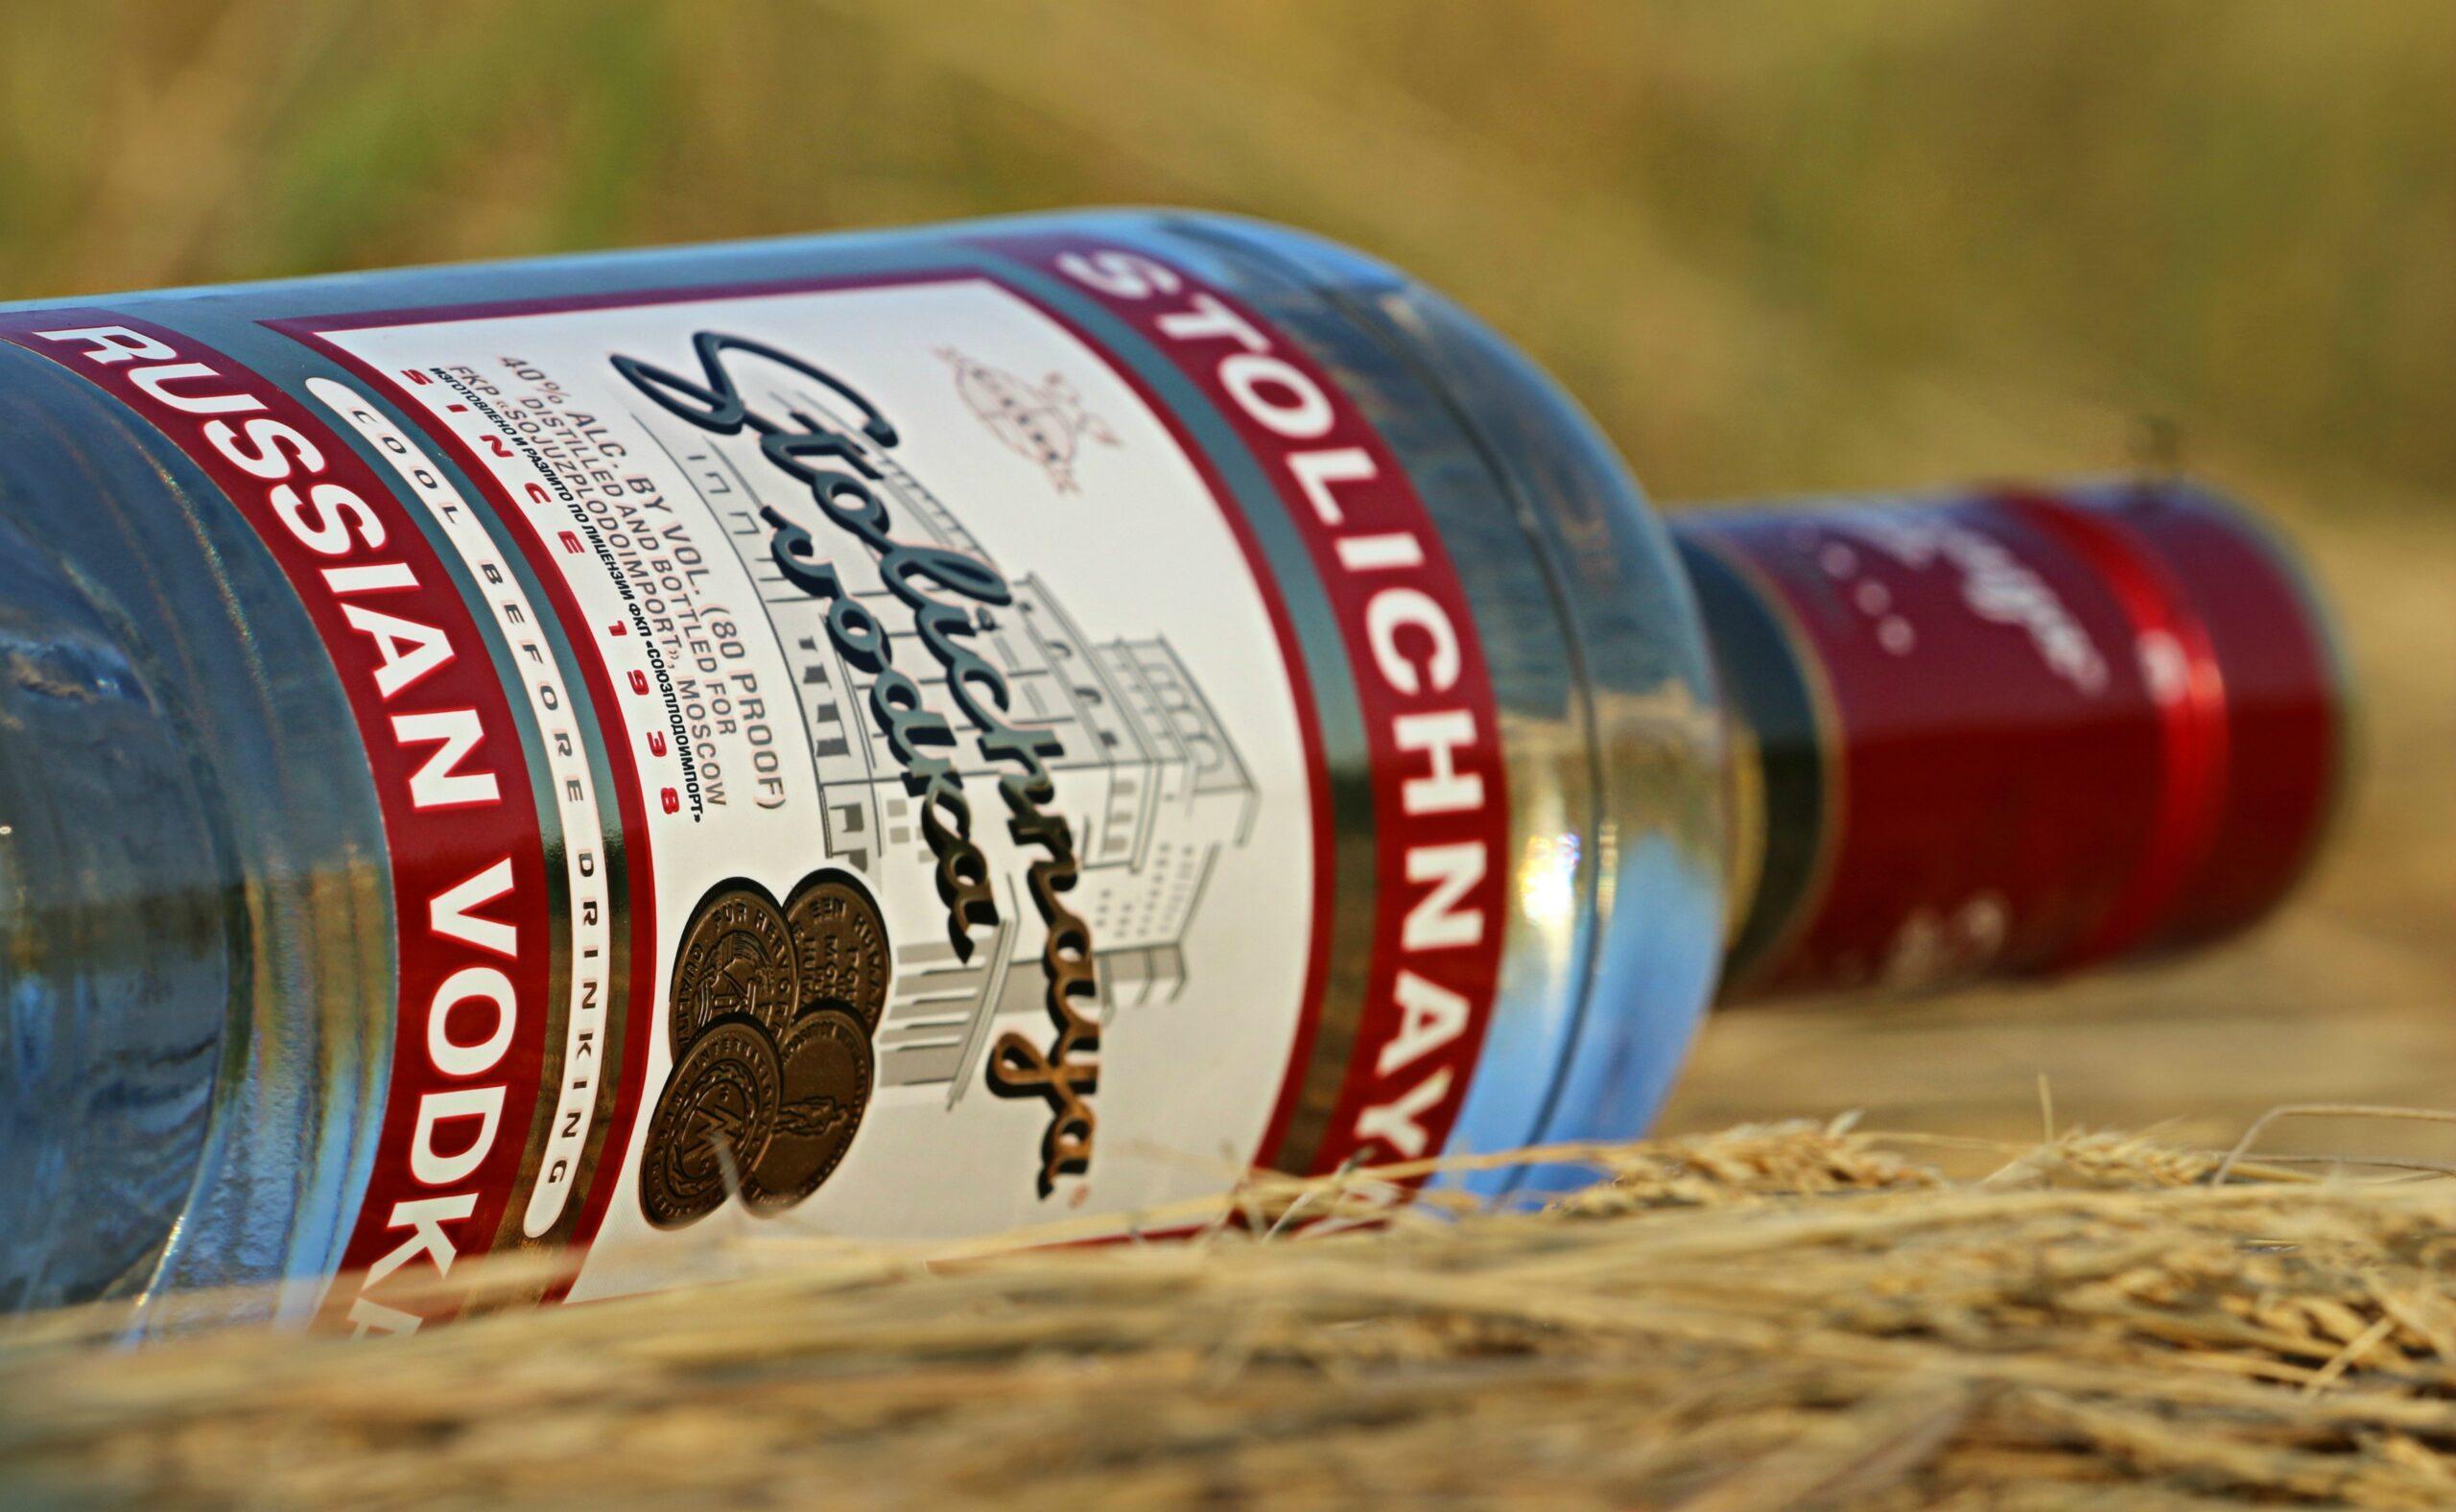 vodka-ruska-alcohol-drunkenness-162986